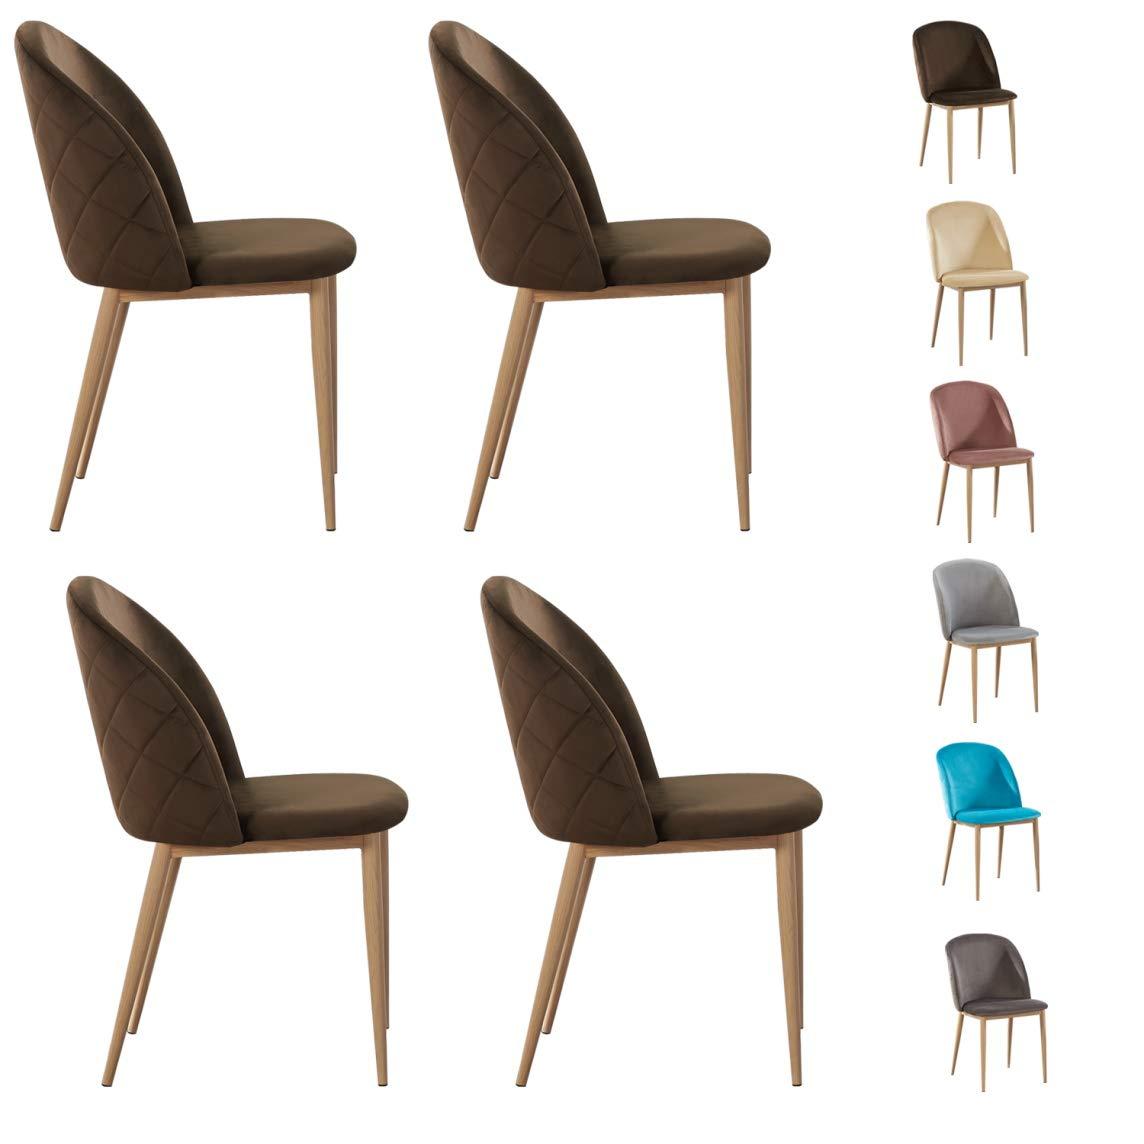 Set of 8 Velvet Dining Chairs with Wood Effect Metal Legs Living Room Chair  Bradley (Brown)